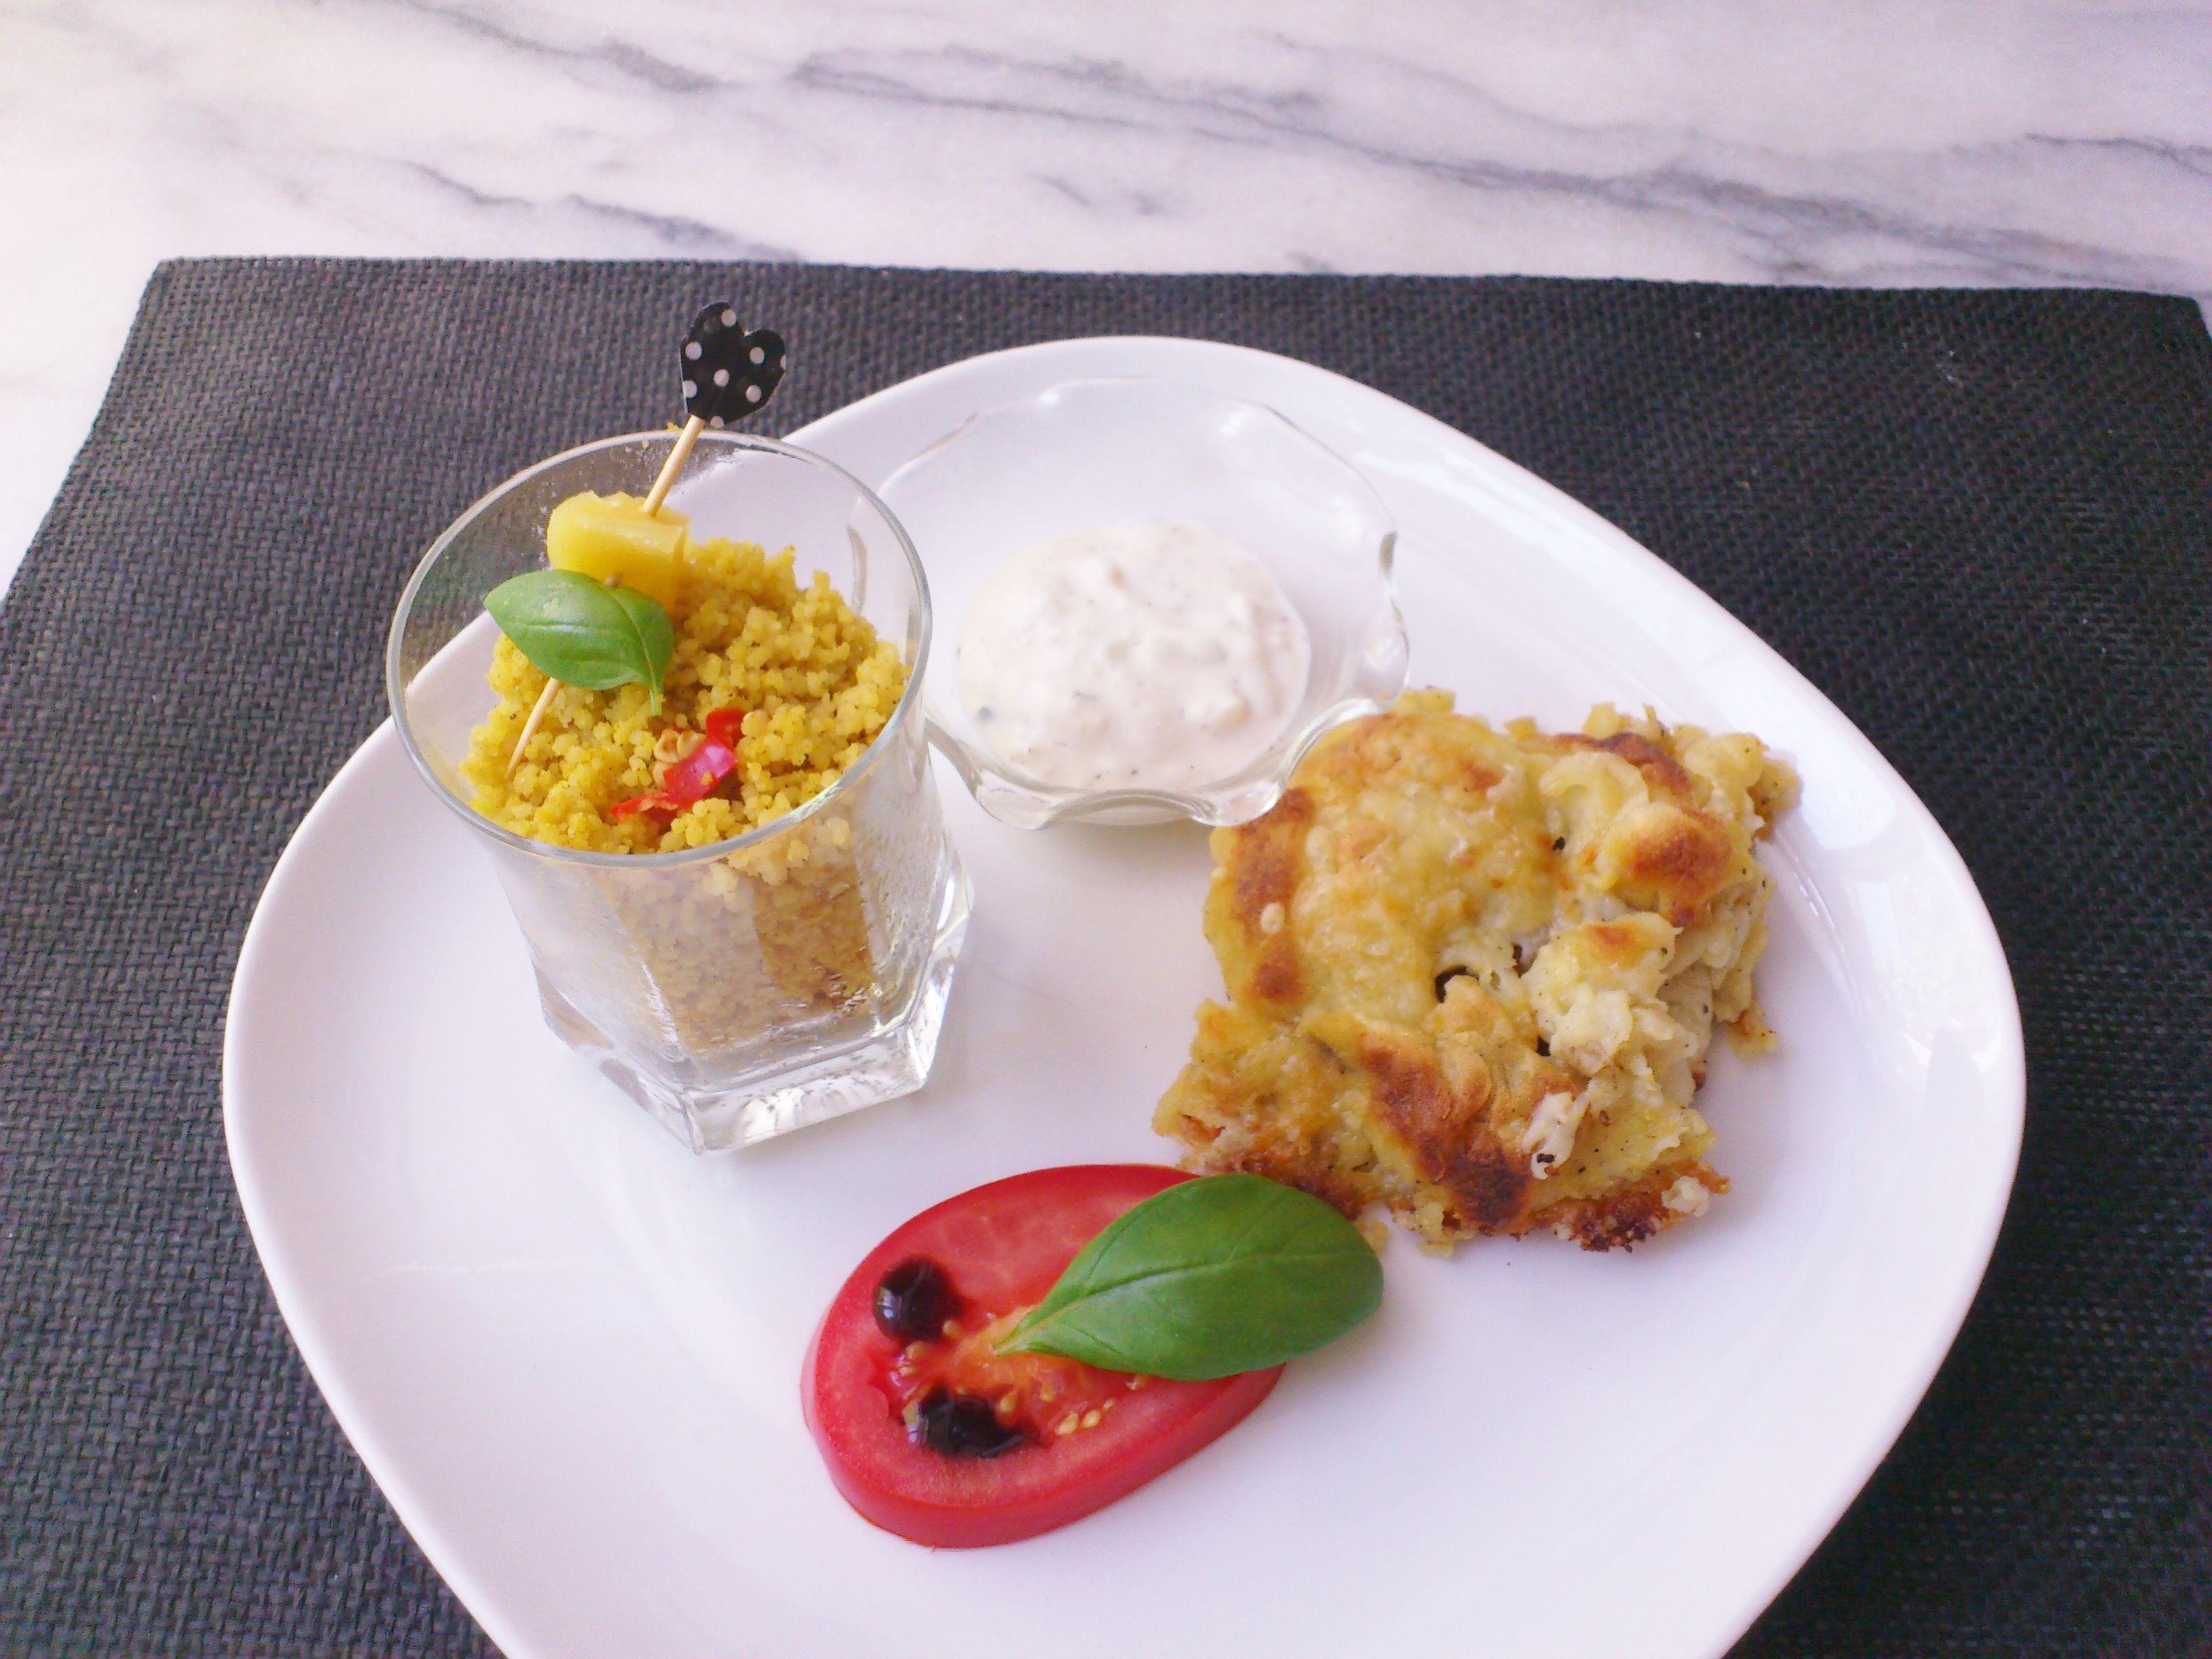 Homemade potato yellow zucchini gratin & #hummus curry couscous! #vegan #organic #glutenfree #Tzatziki #food